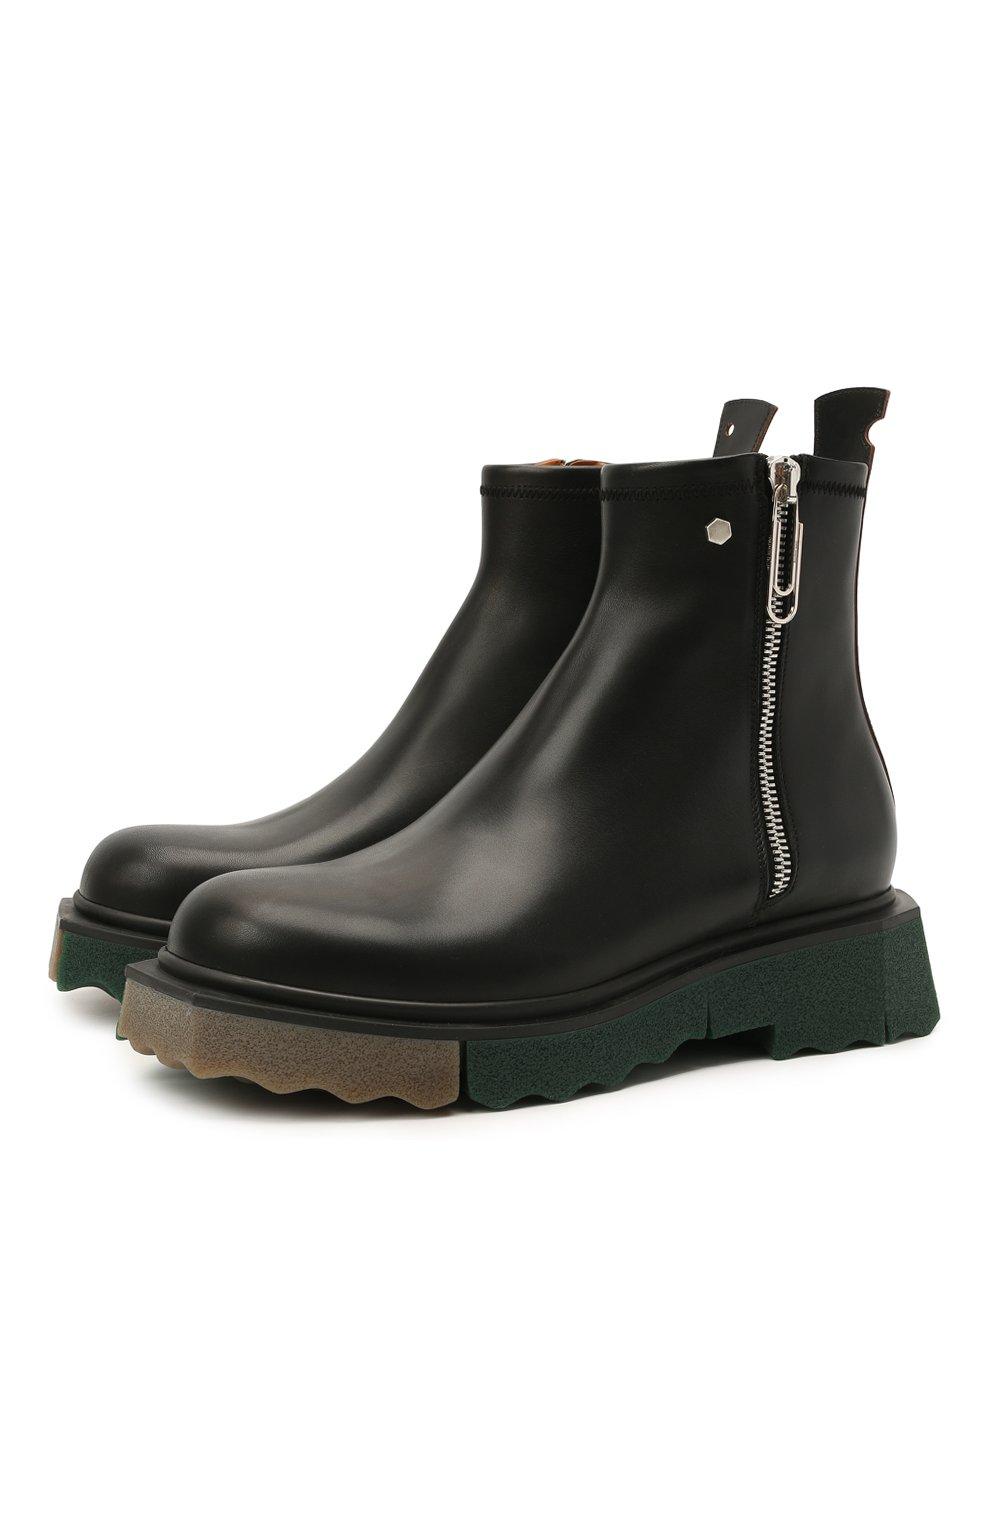 Мужские кожаные сапоги OFF-WHITE черного цвета, арт. 0MID004S21LEA0011010 | Фото 1